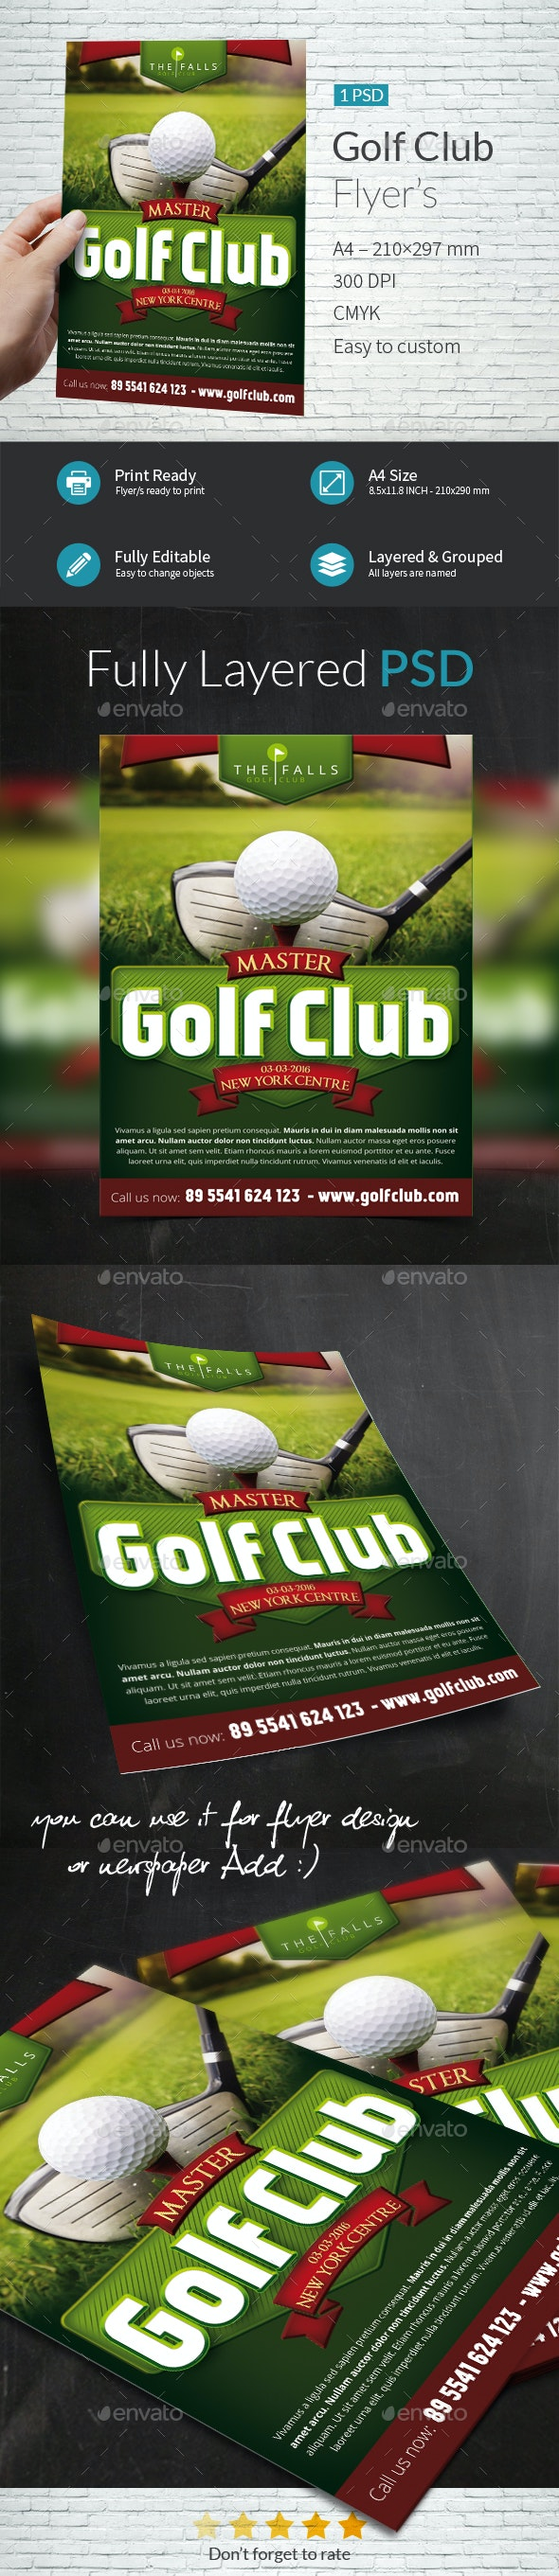 Golf Club A4 Flyer Template - Flyers Print Templates